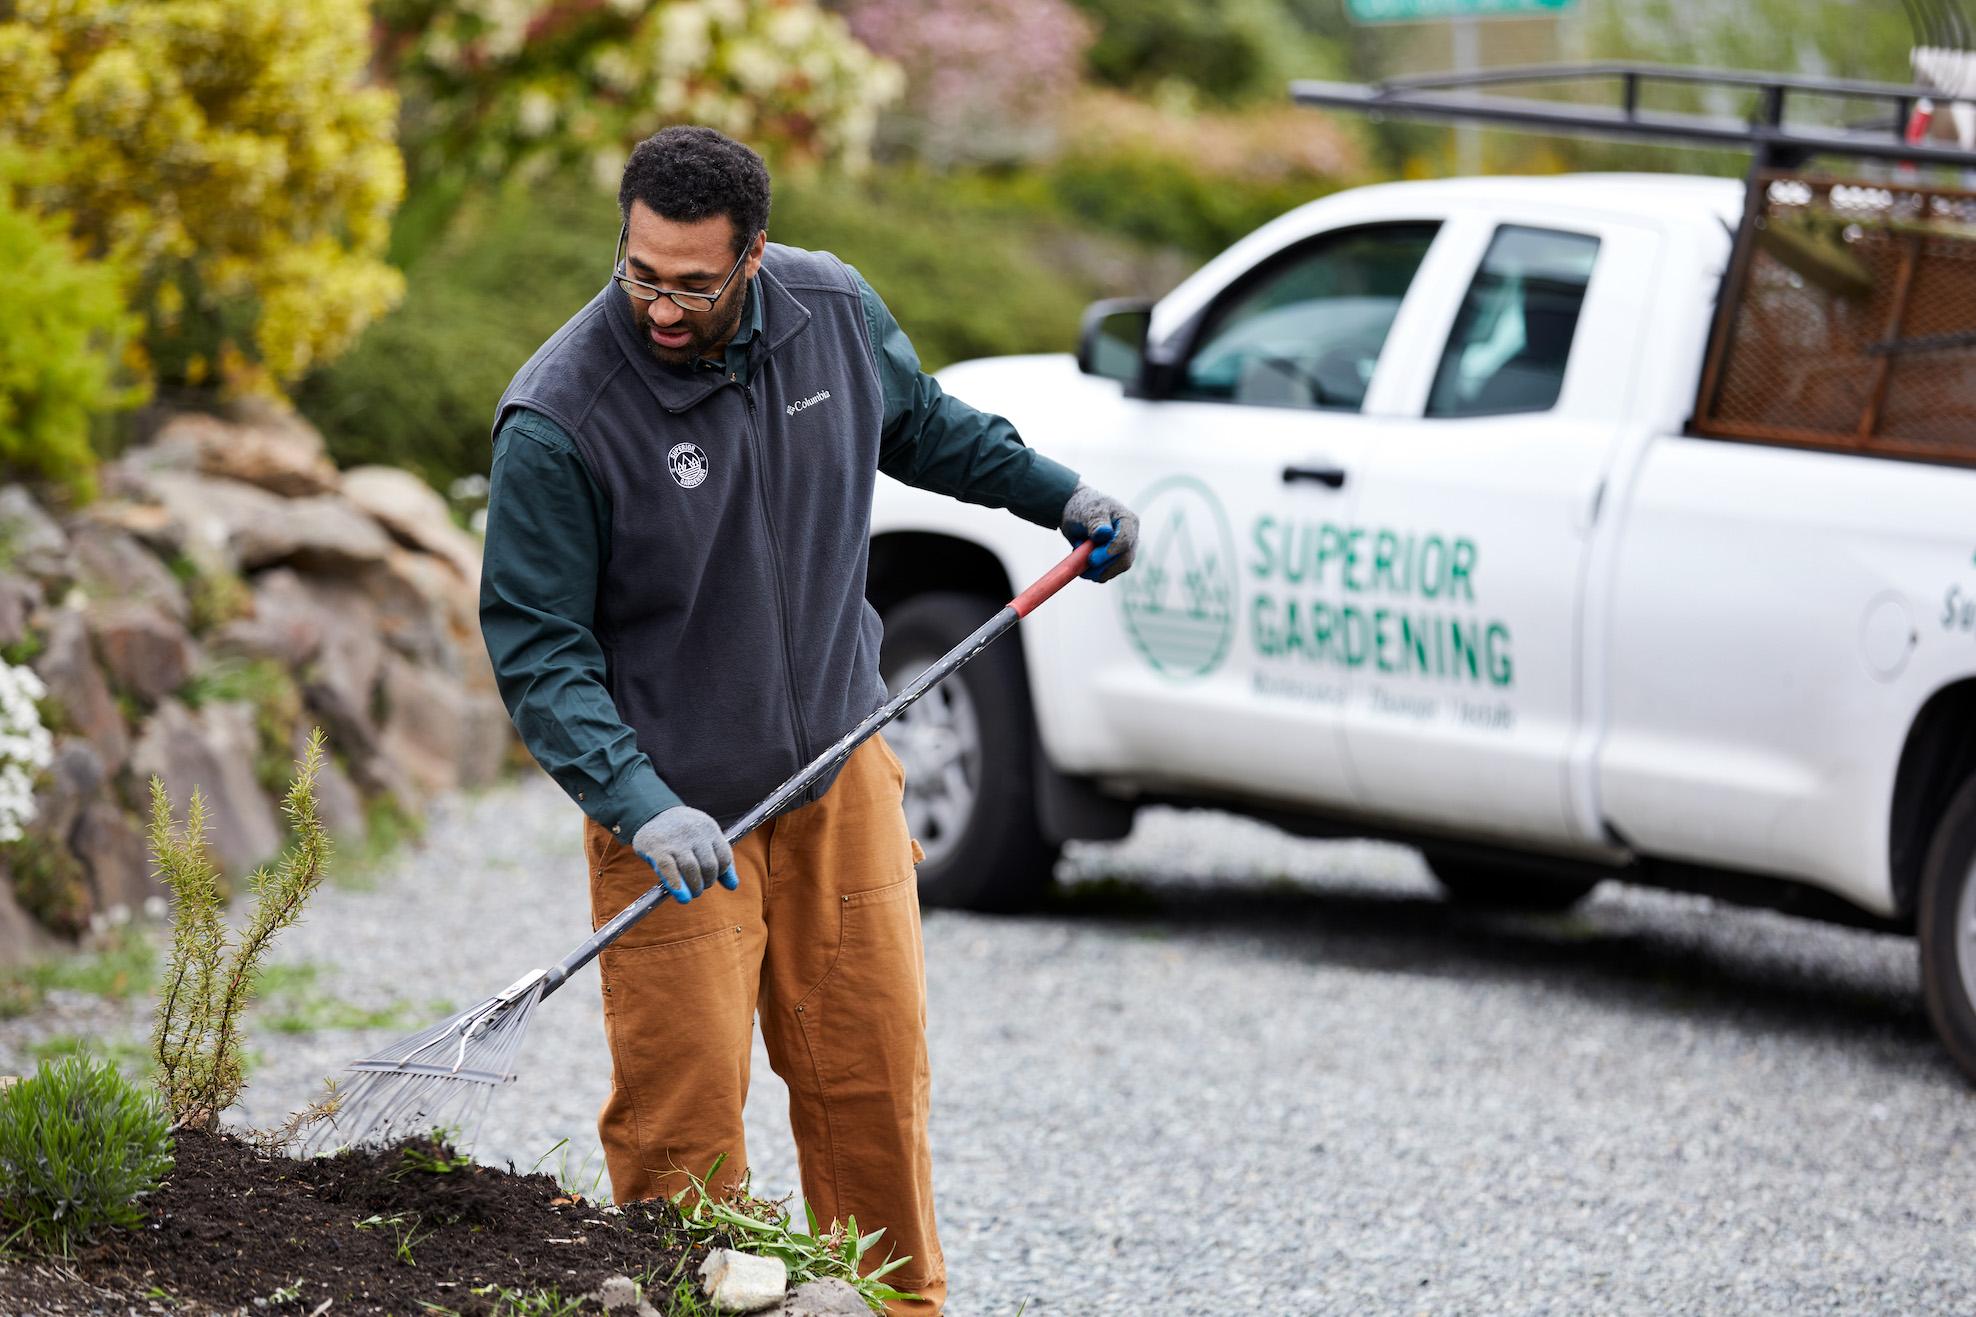 Superior Gardening Landscaper Blowing Leaves for Superior Gardening Seattle.jpg